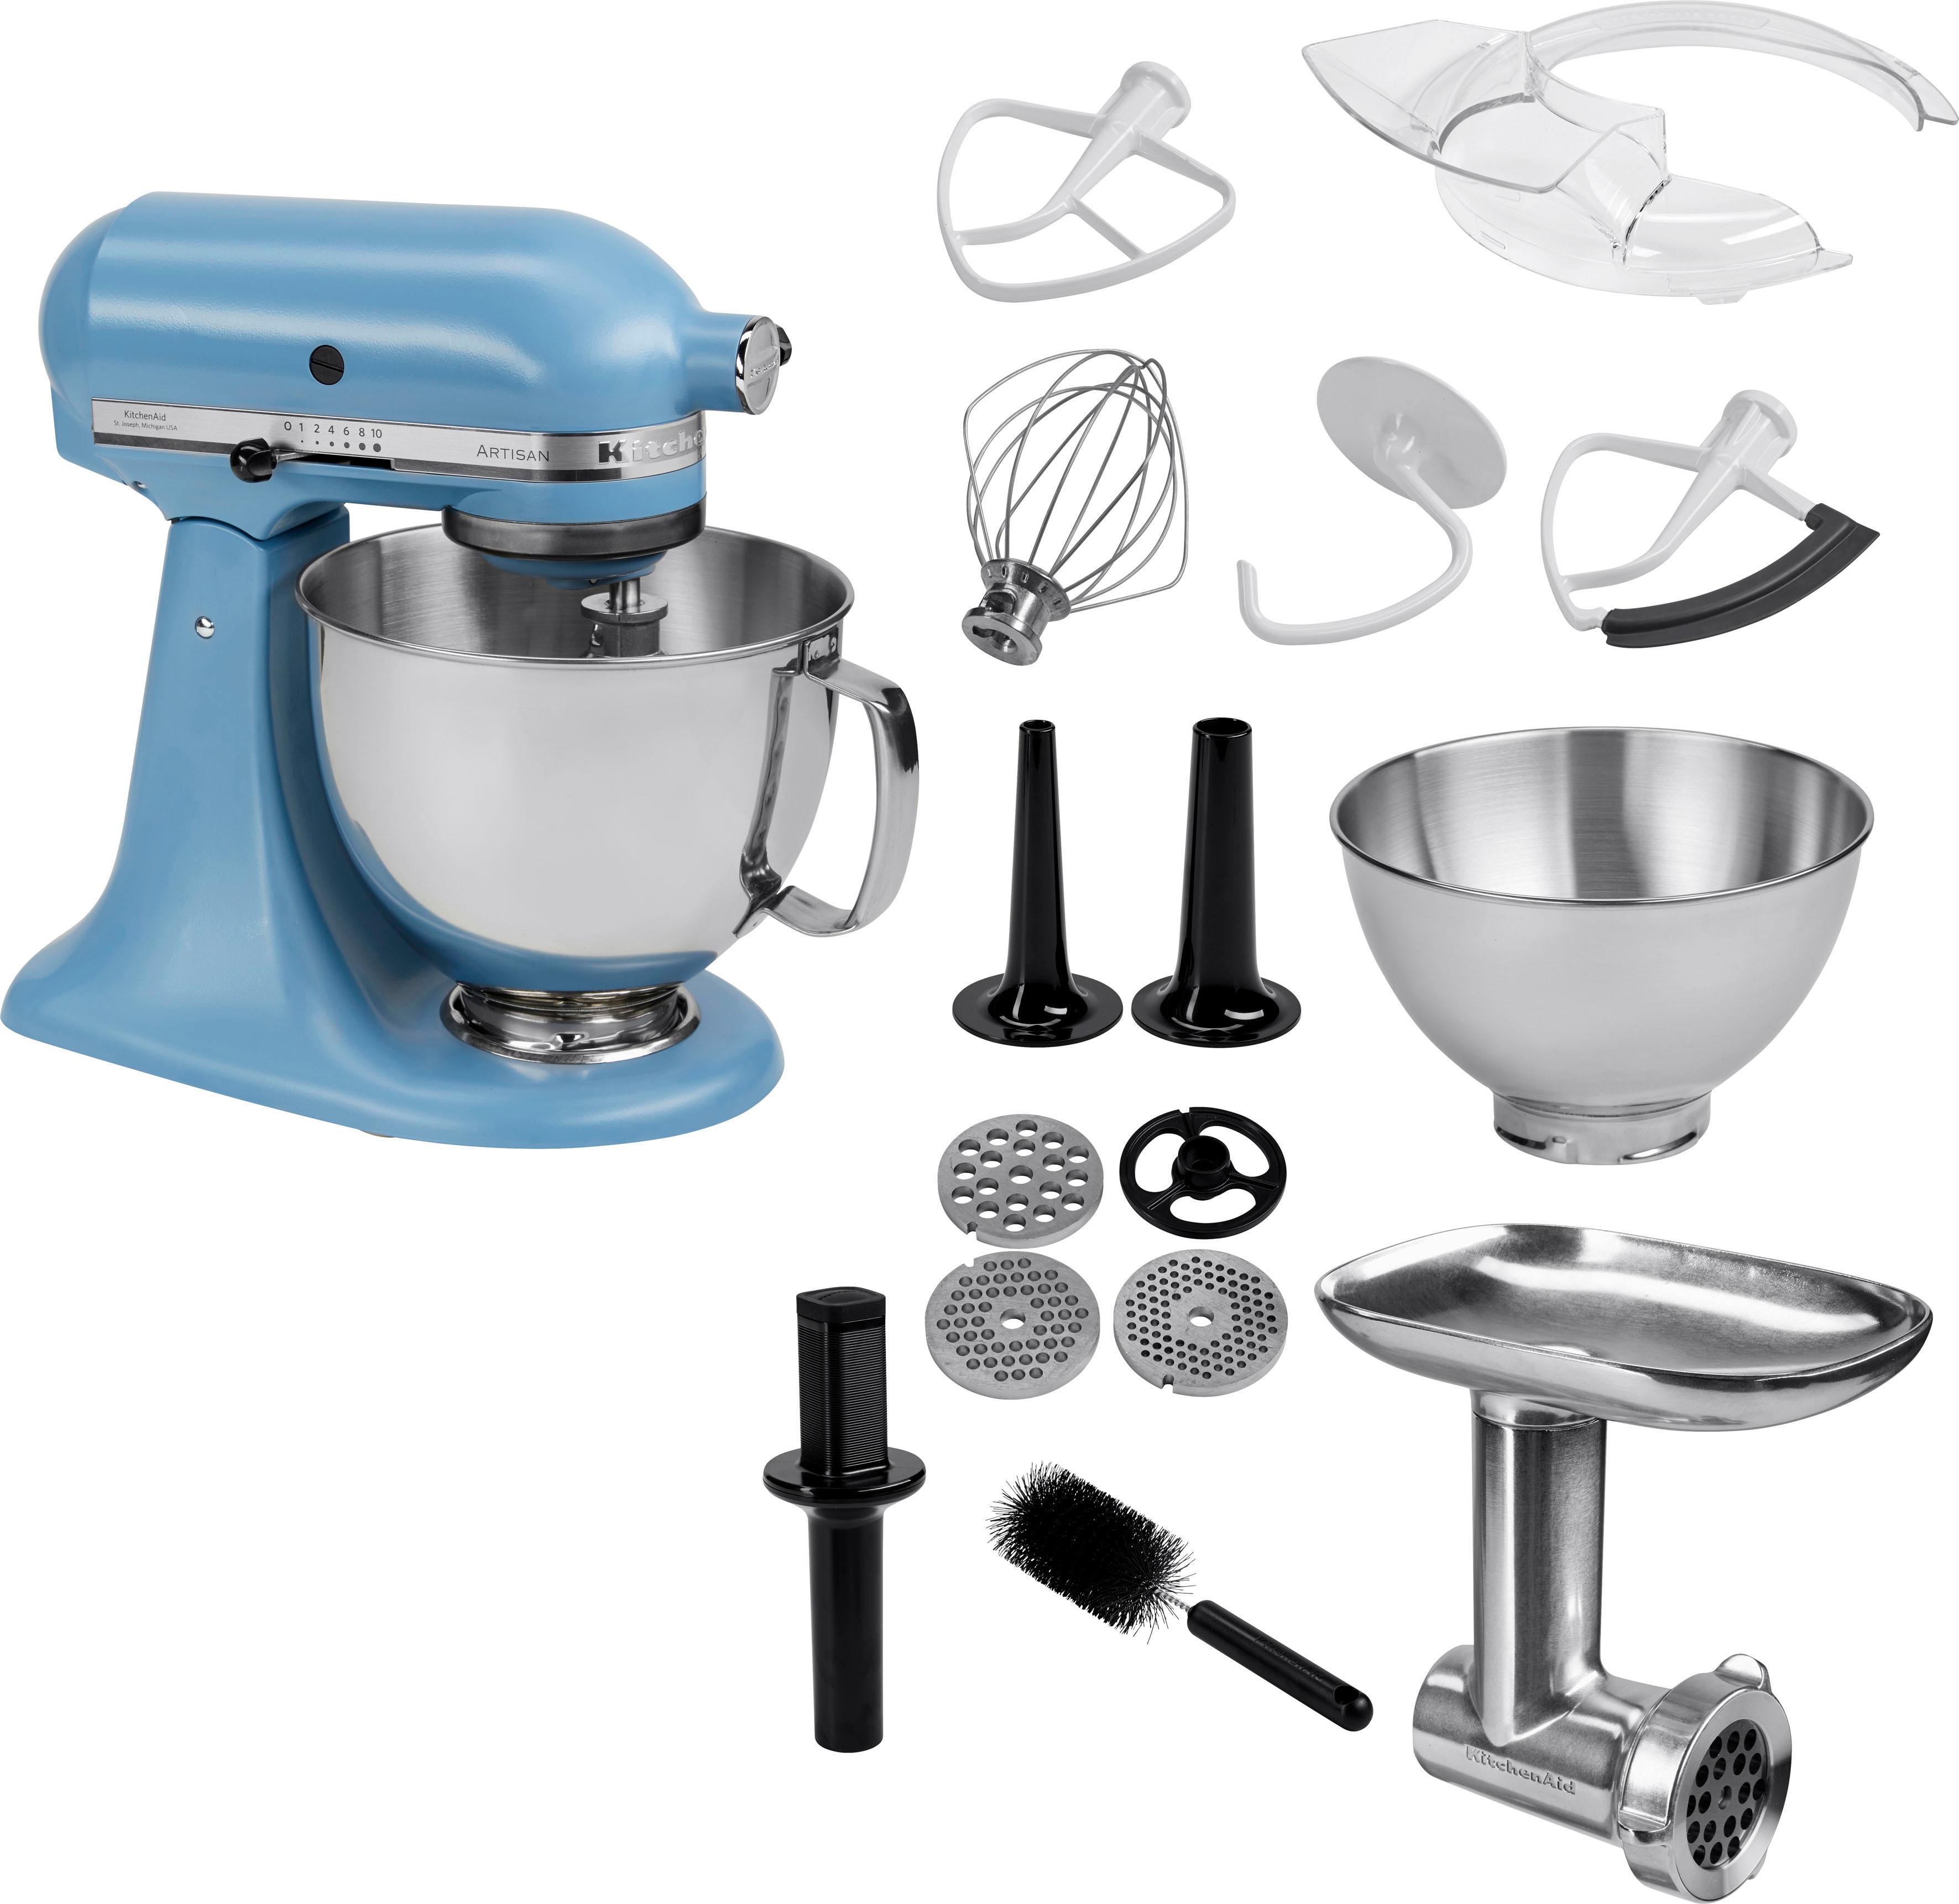 Kitchenaid Kuchenmaschine Artisan 5ksm175psevb Mit Gratis Ganzmetall